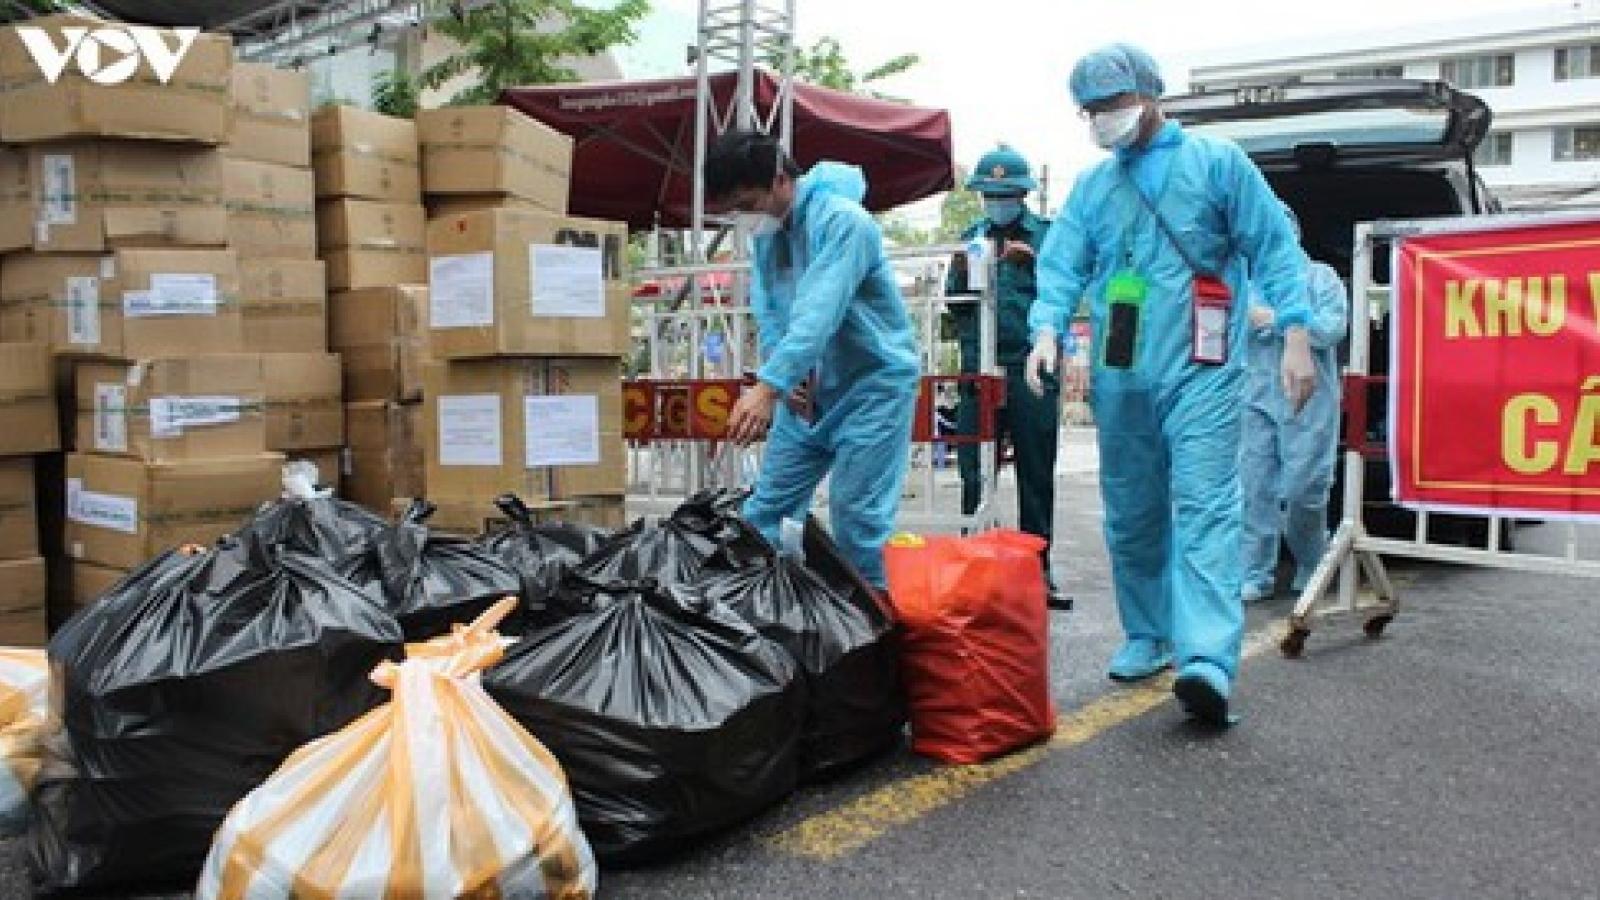 COVID-19 cases in Vietnam pass 800 mark